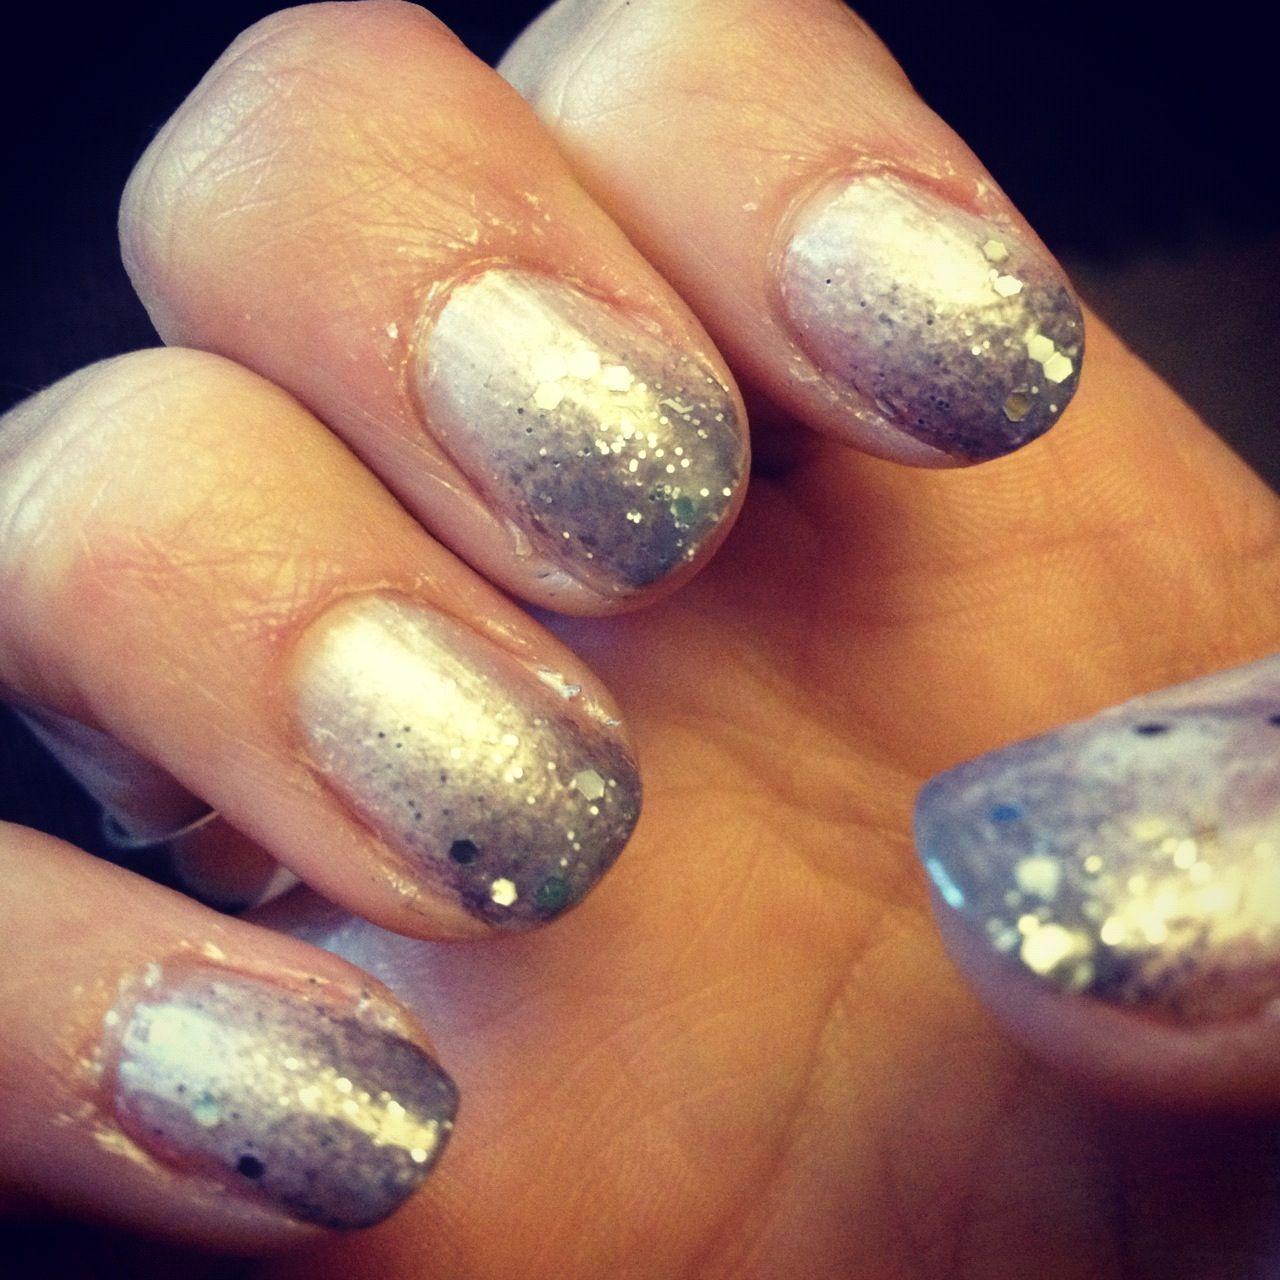 grey acrylic nails with ombré glitter 🧸💞 | Nails, Acrylic